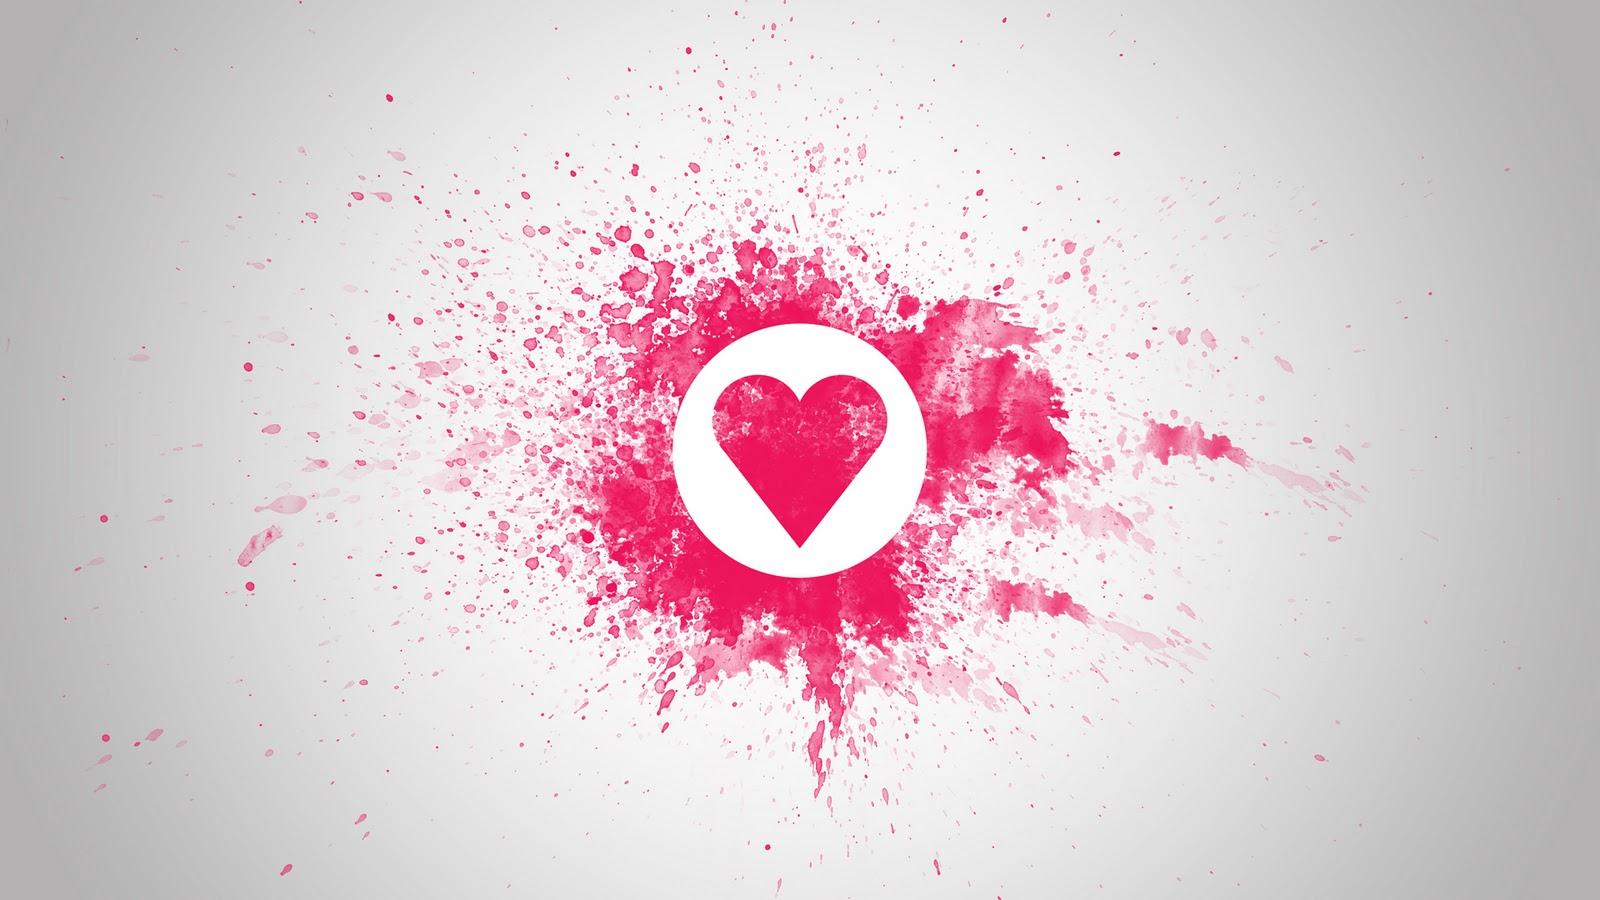 Love Heart Wallpaper Hd: Love Heart Pink 1600x900 HD Wallpaper